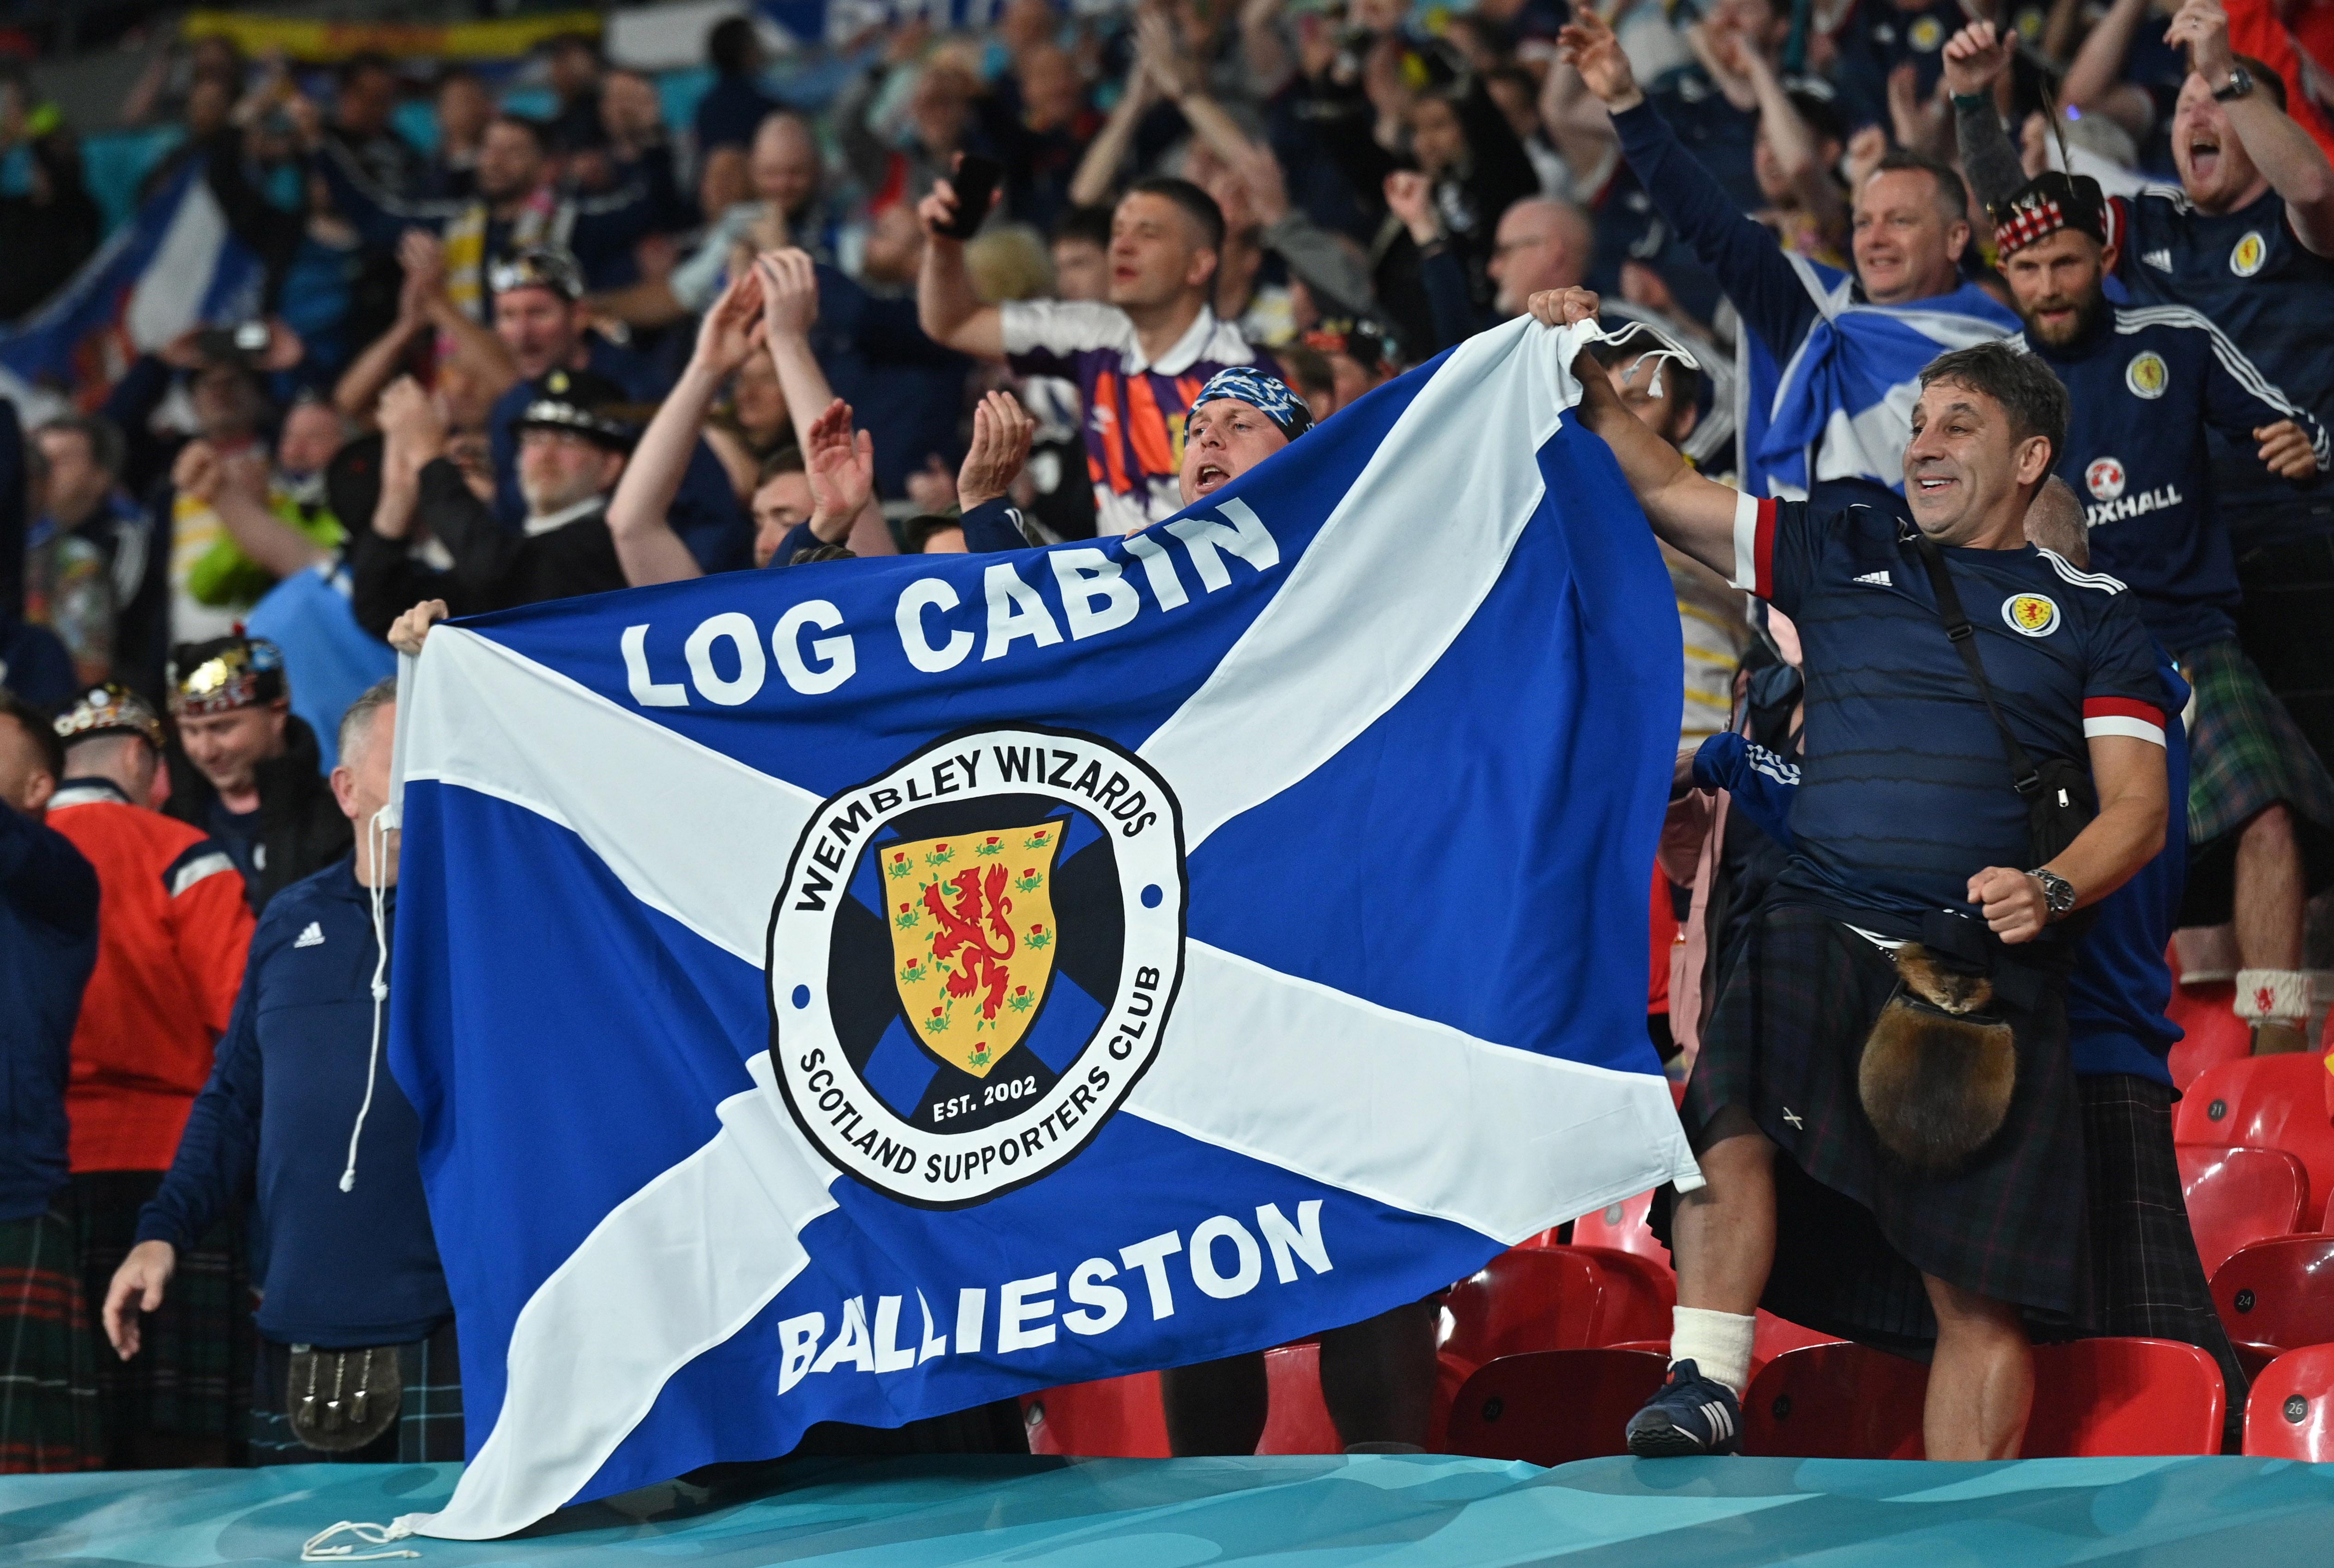 Soccer Football - Euro 2020 - Group D - England v Scotland - Wembley Stadium, London, Britain - June 18, 2021. Scotland fans celebrate after the match Pool via REUTERS/Justin Tallis